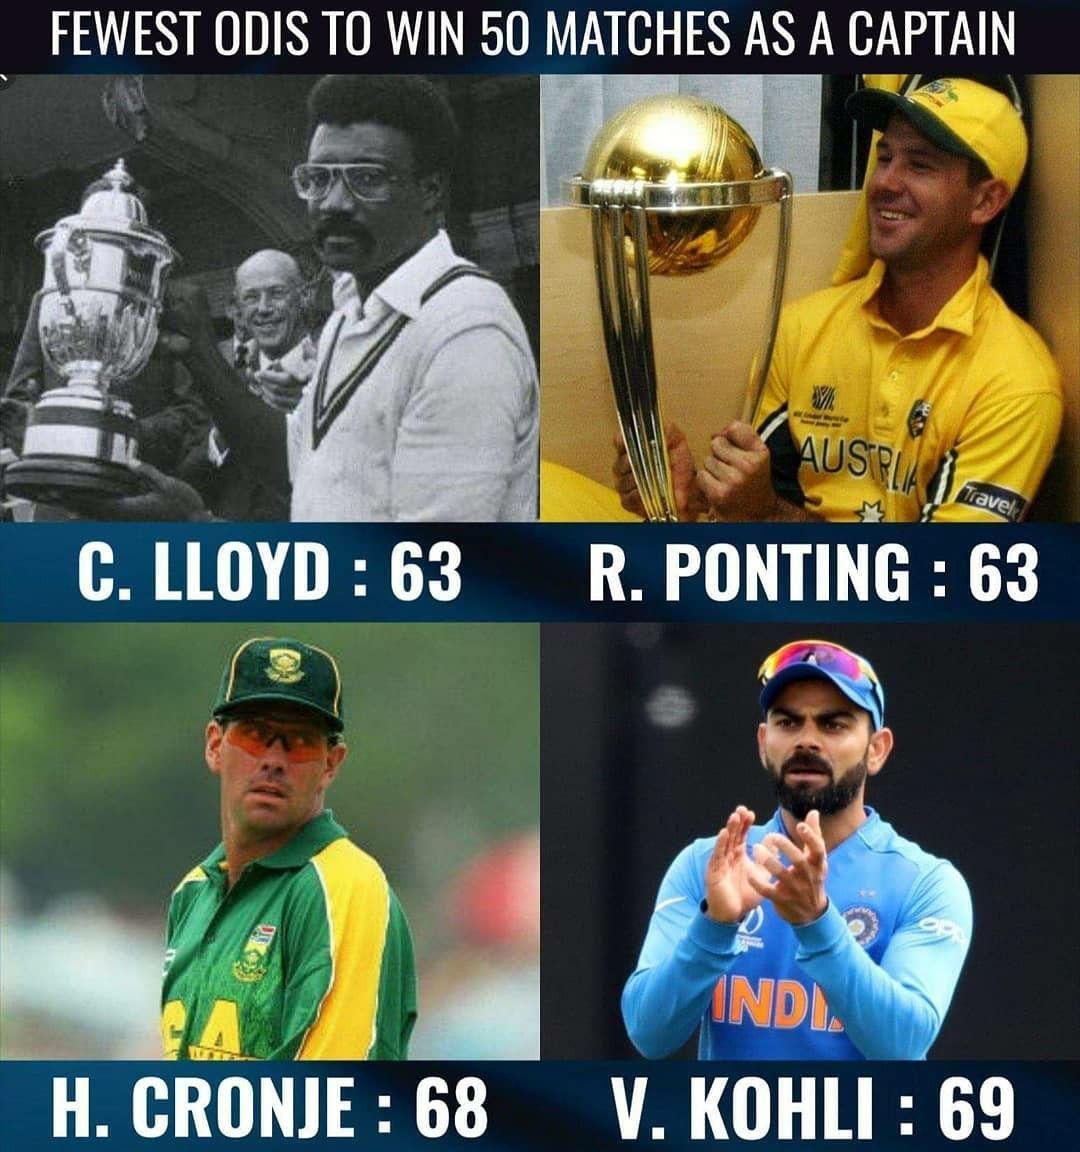 Pin on Cricket Addiction!